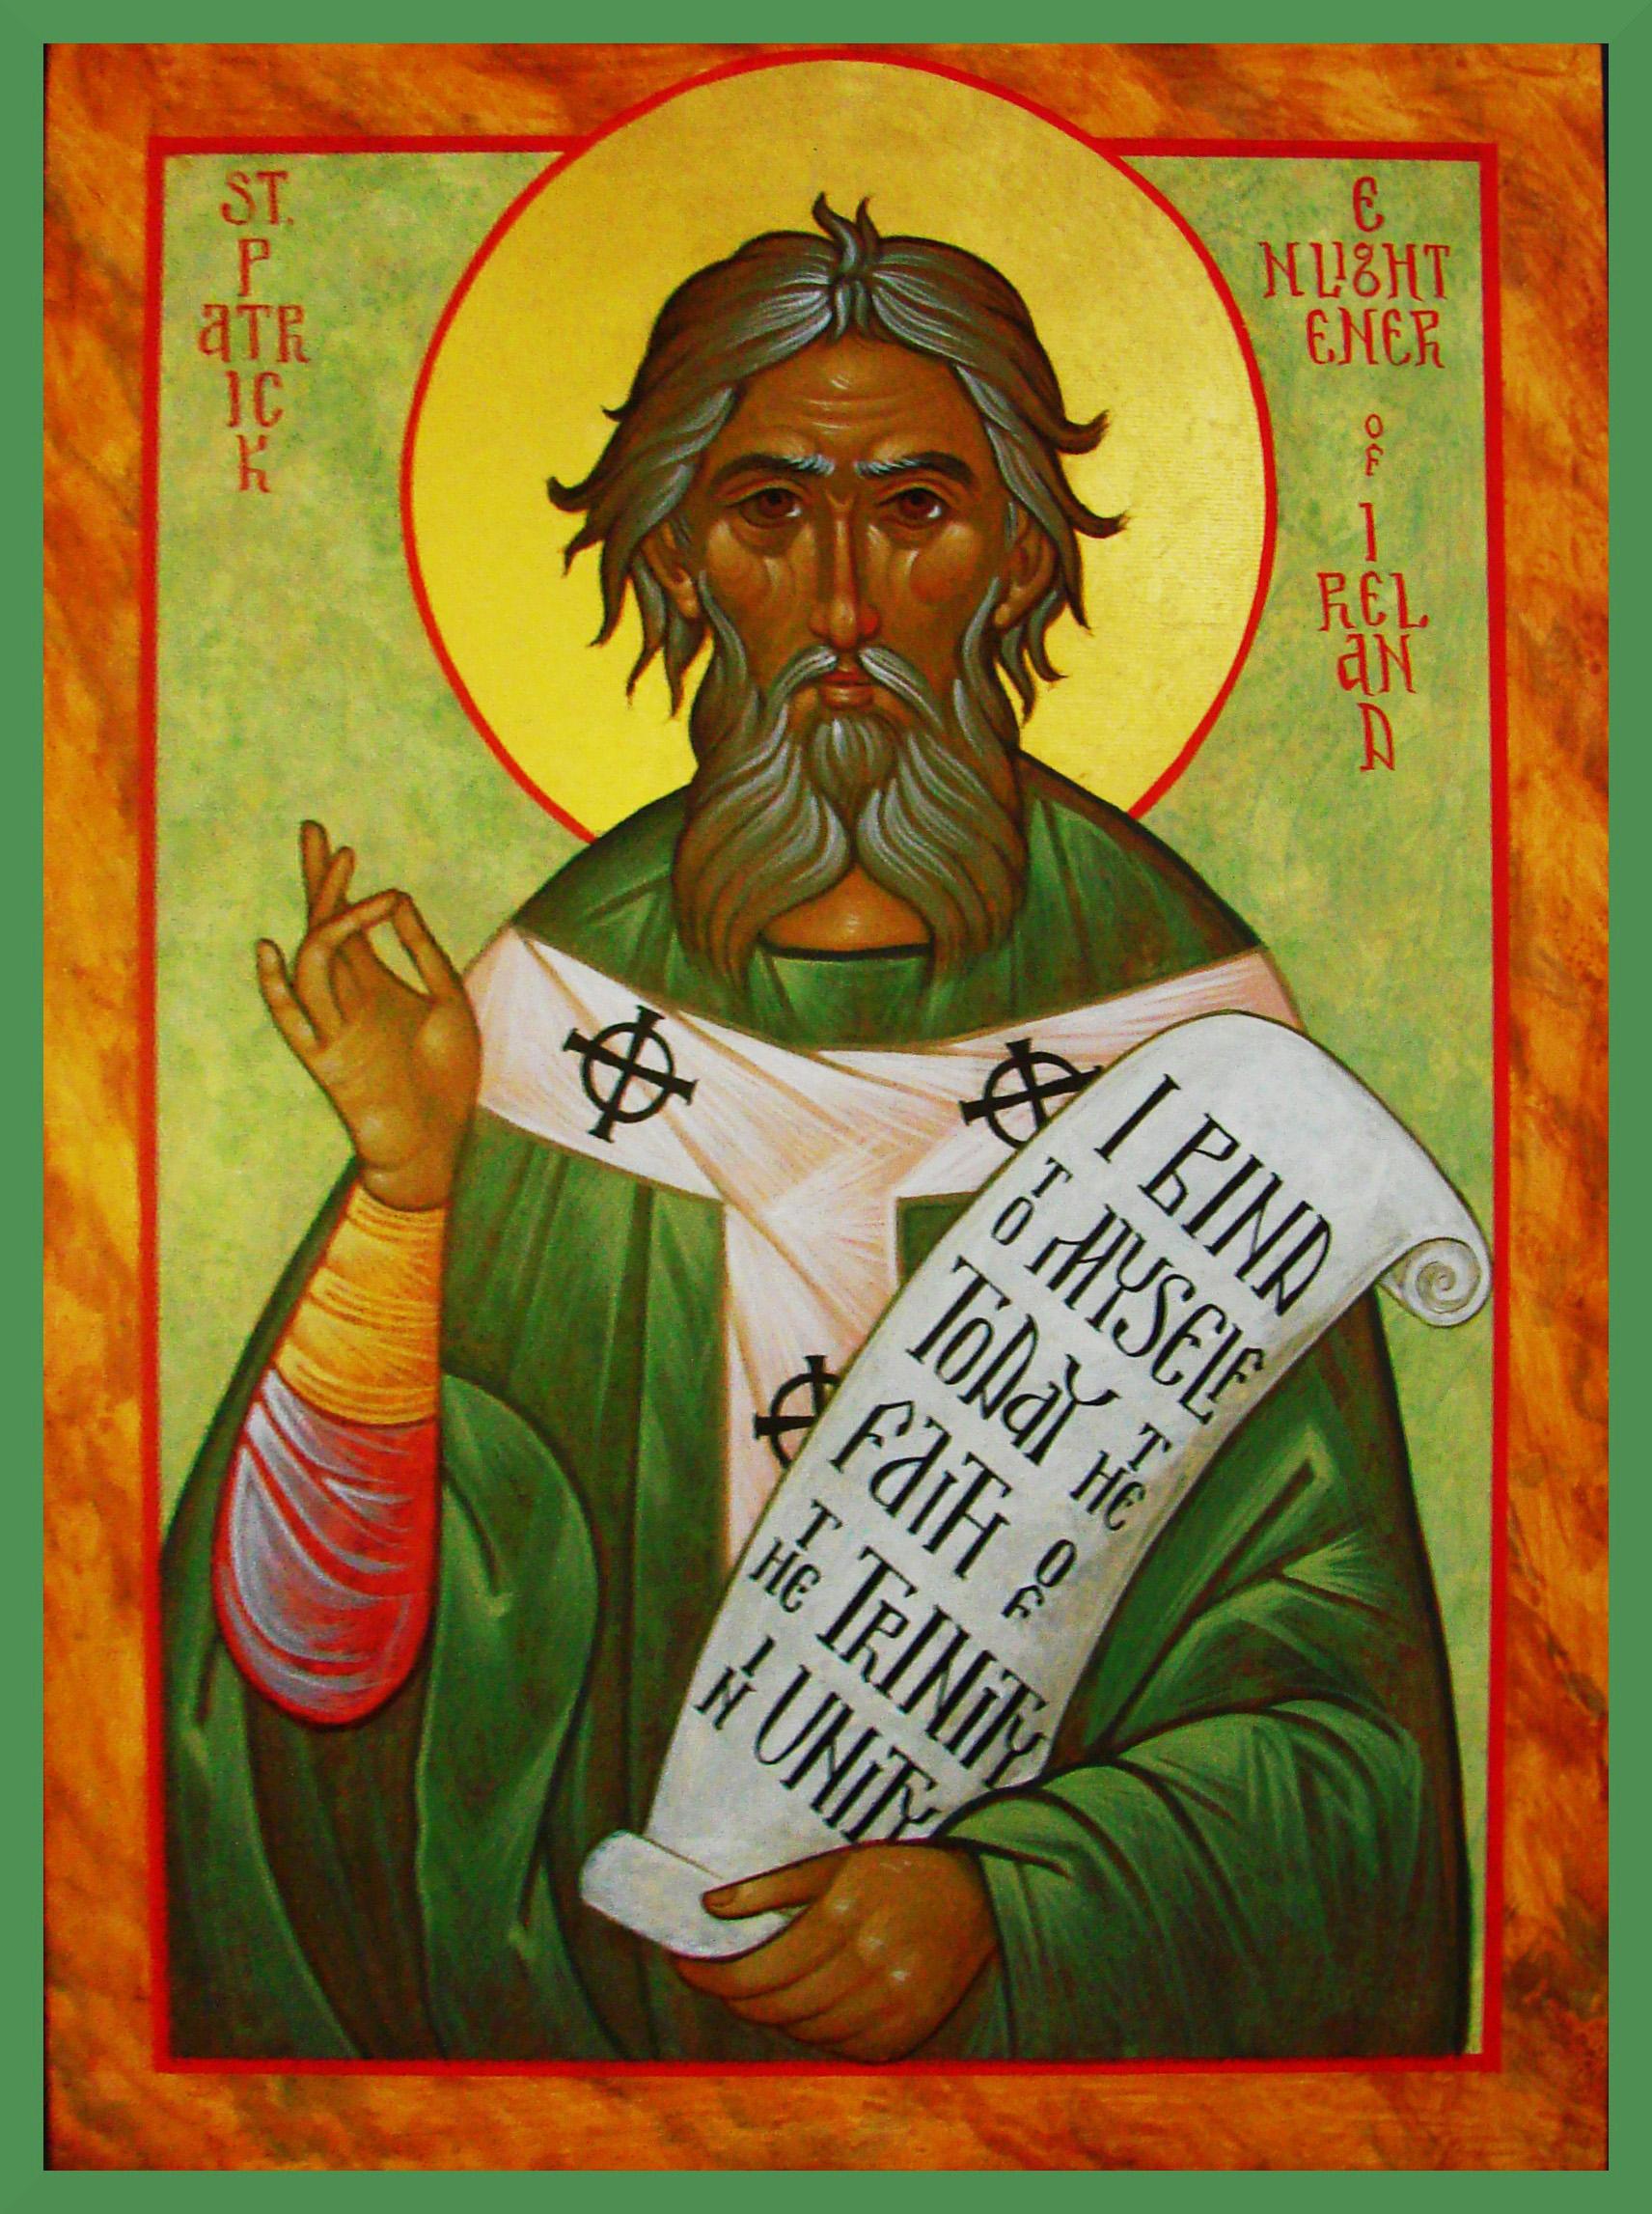 Sf. Patrick